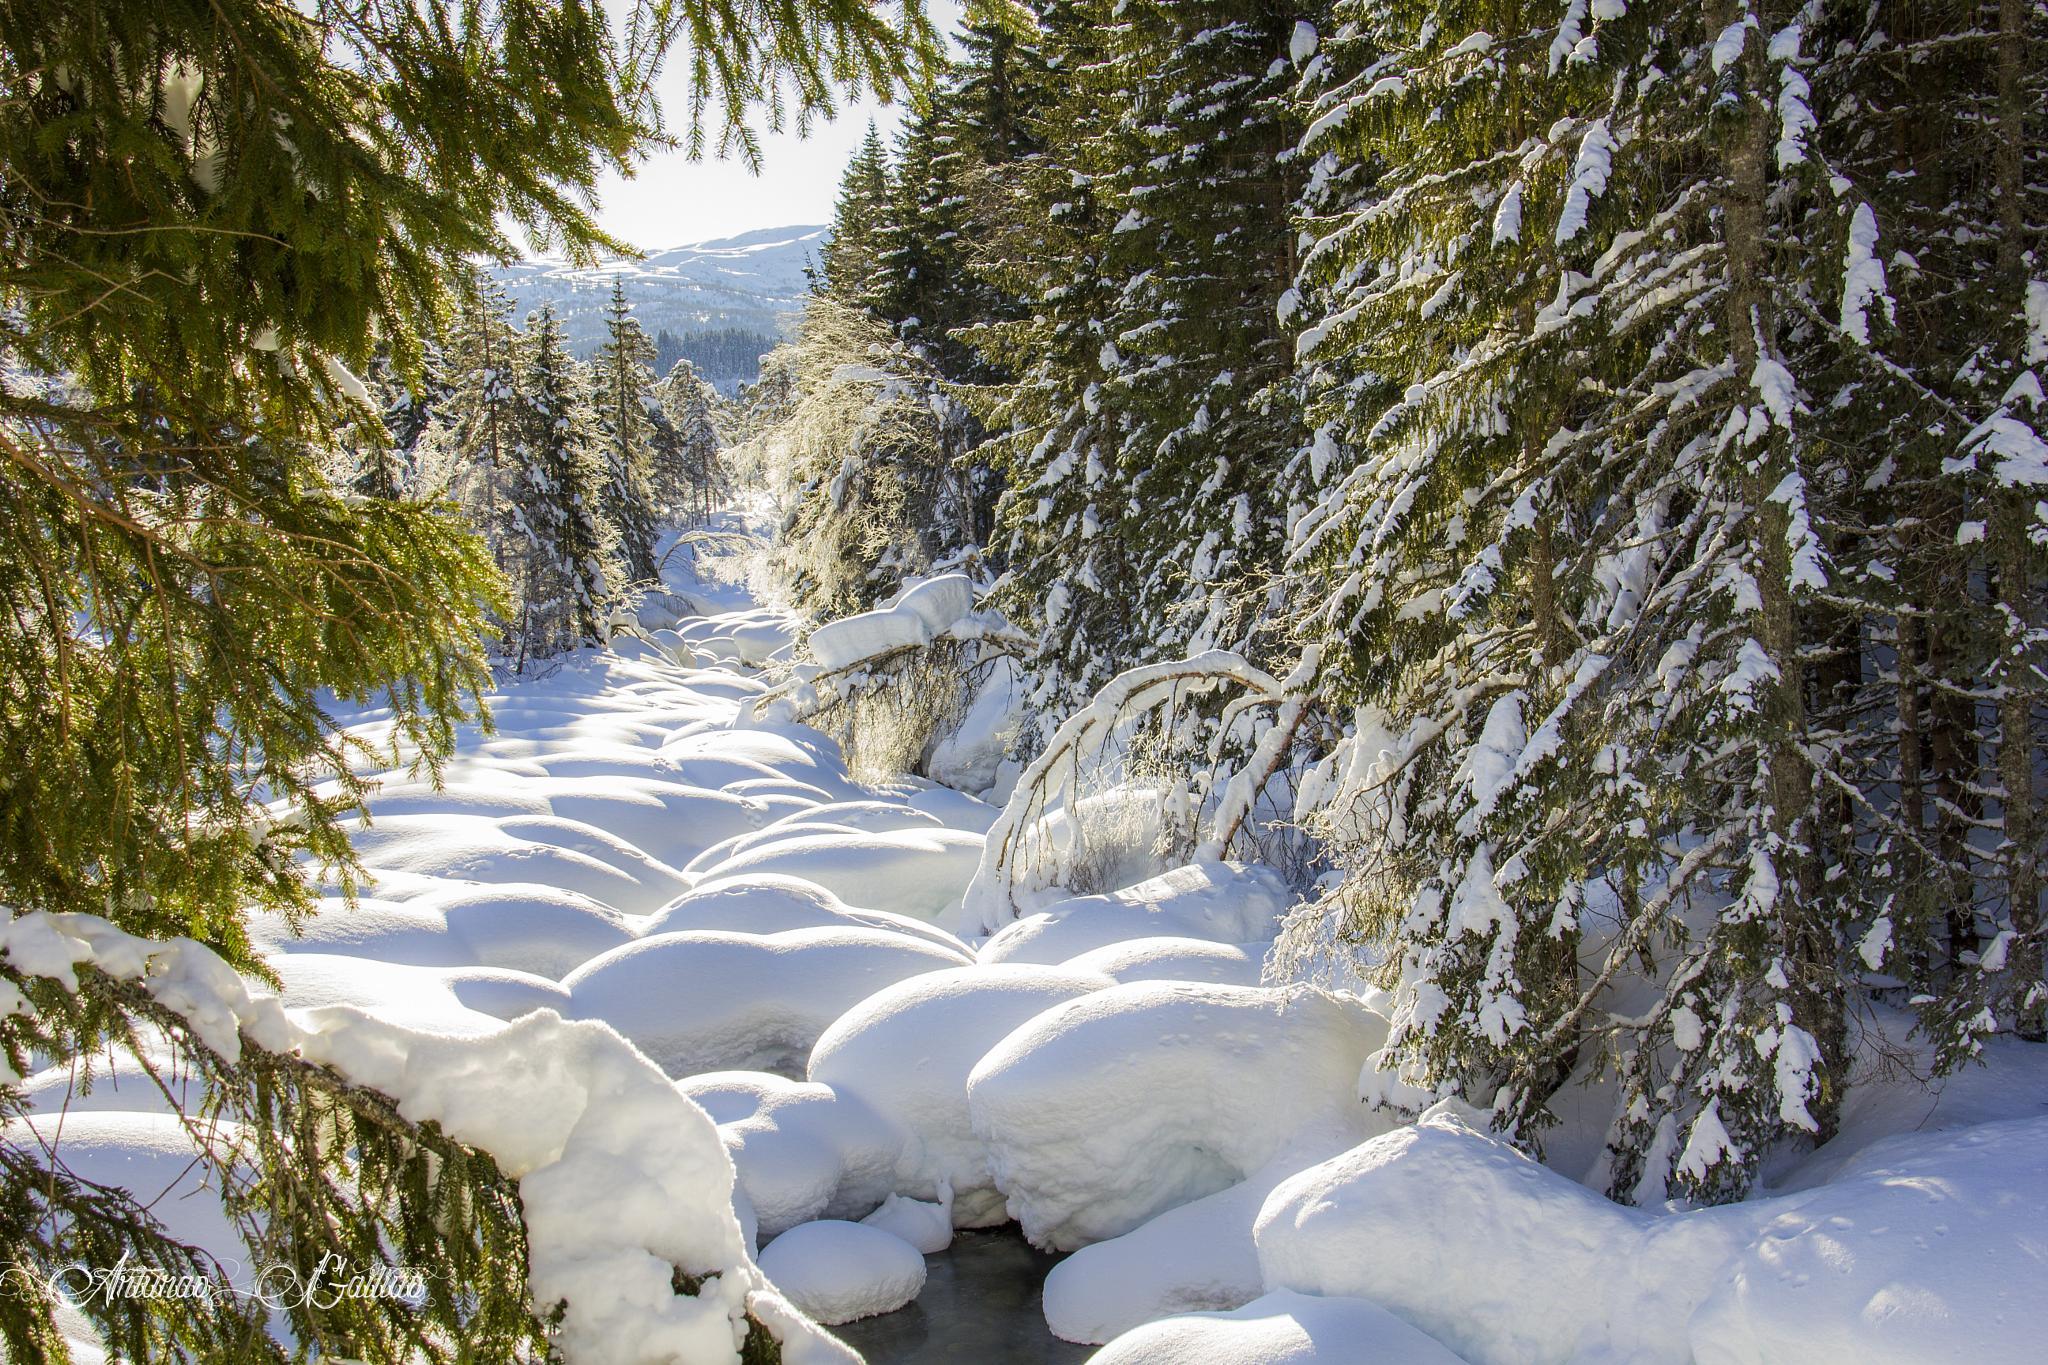 Snow covers the river by Arturas Gailius